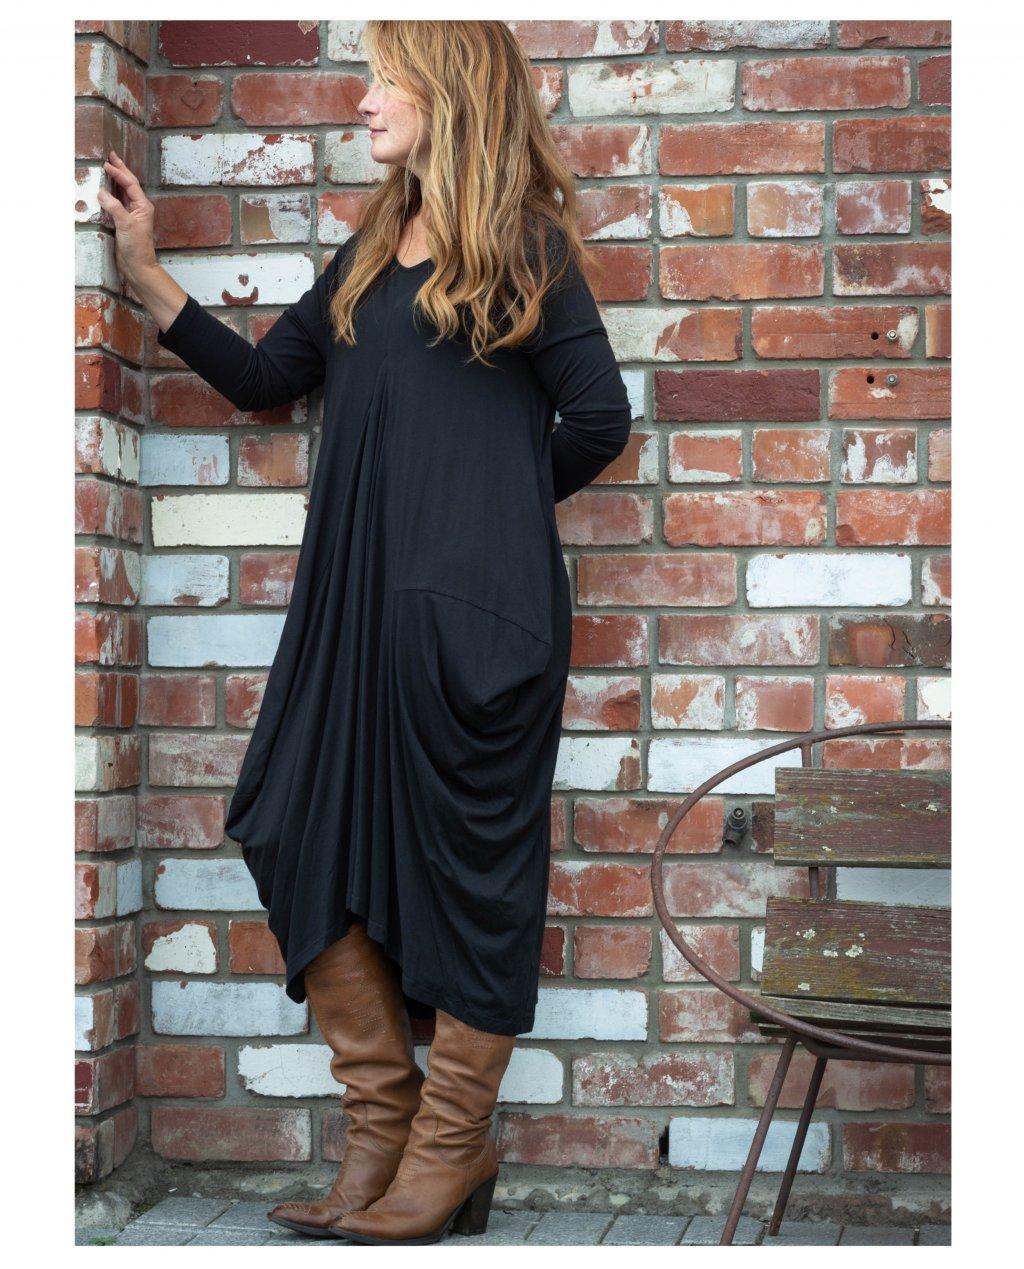 Jason Lingard | Helios Dress | Black